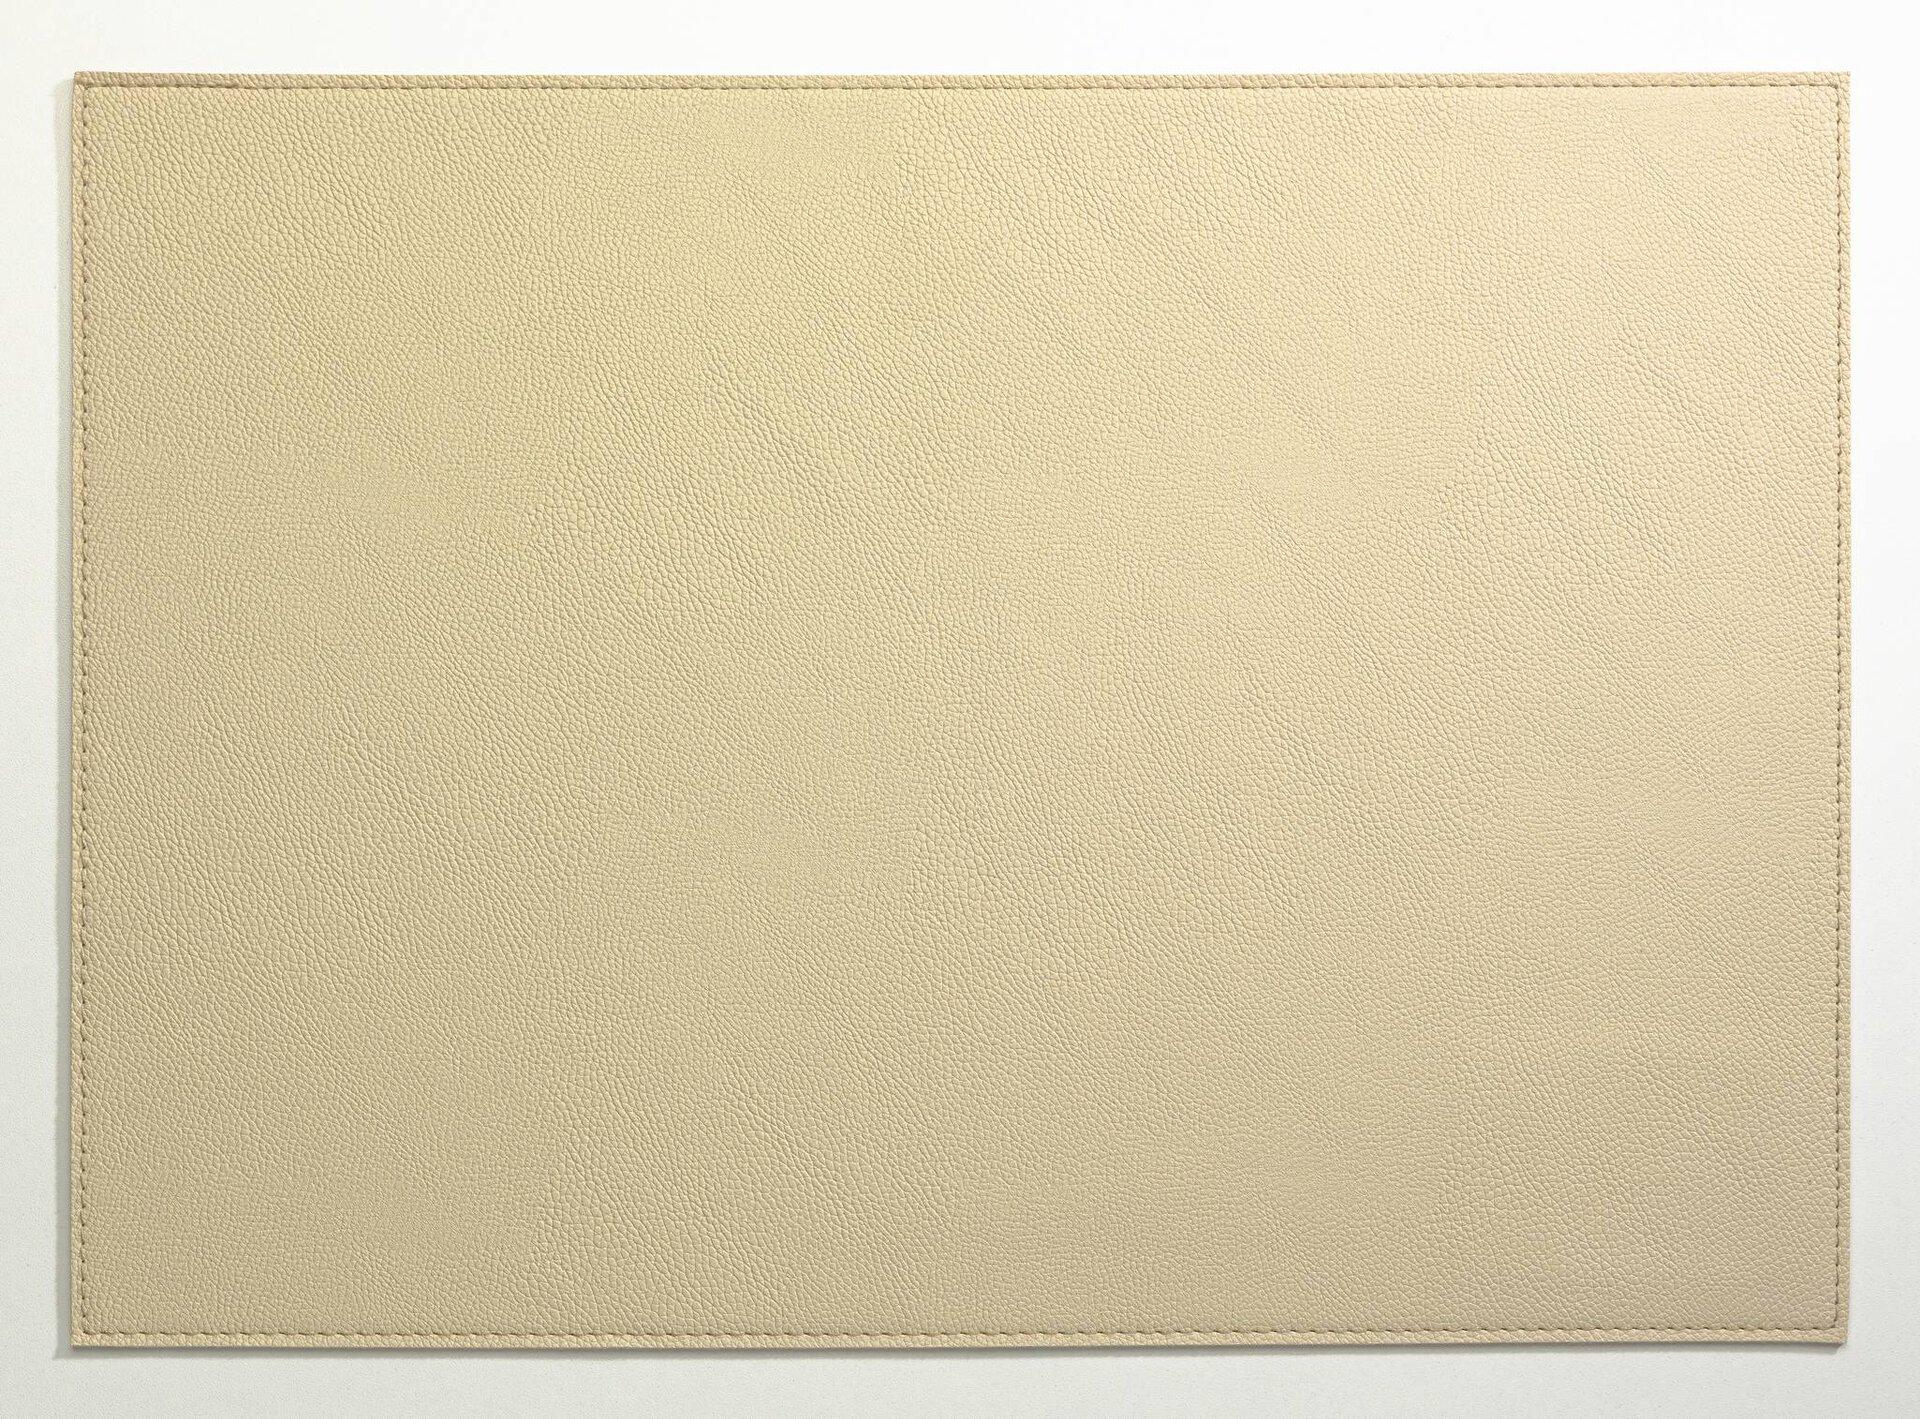 Tischset 174180 Casa Nova Casa Nova Kunststoff 33 x 46 x